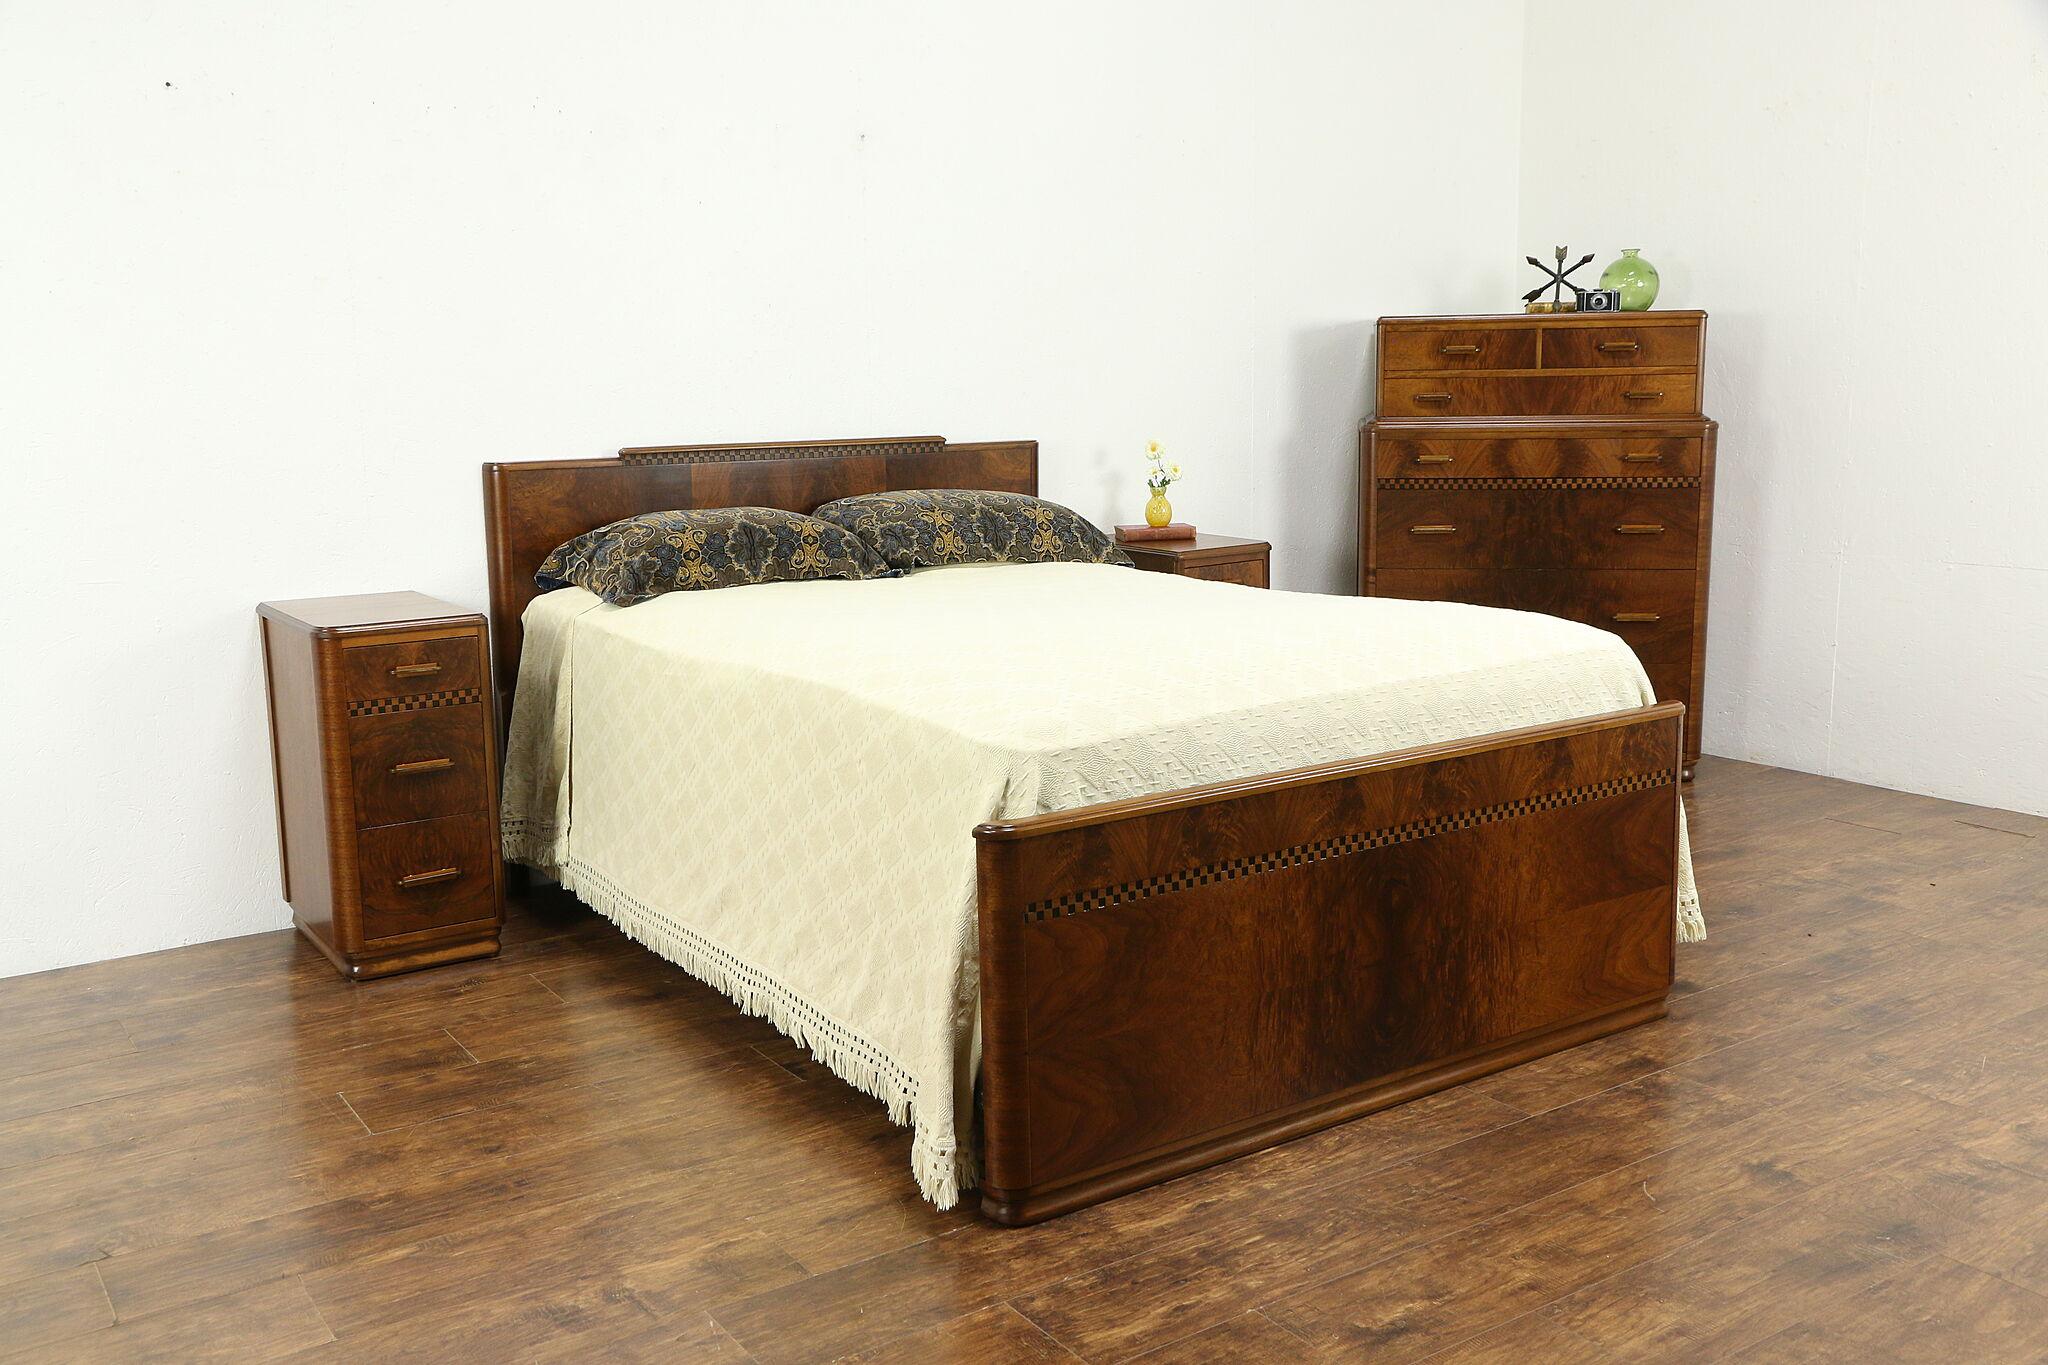 Sold Art Deco Vintage 4 Pc Bedroom Set Full Size Bed Highboy 2 Nightstands 34220 Harp Gallery Antiques Furniture,Modern Bathroom Wall Art Ideas